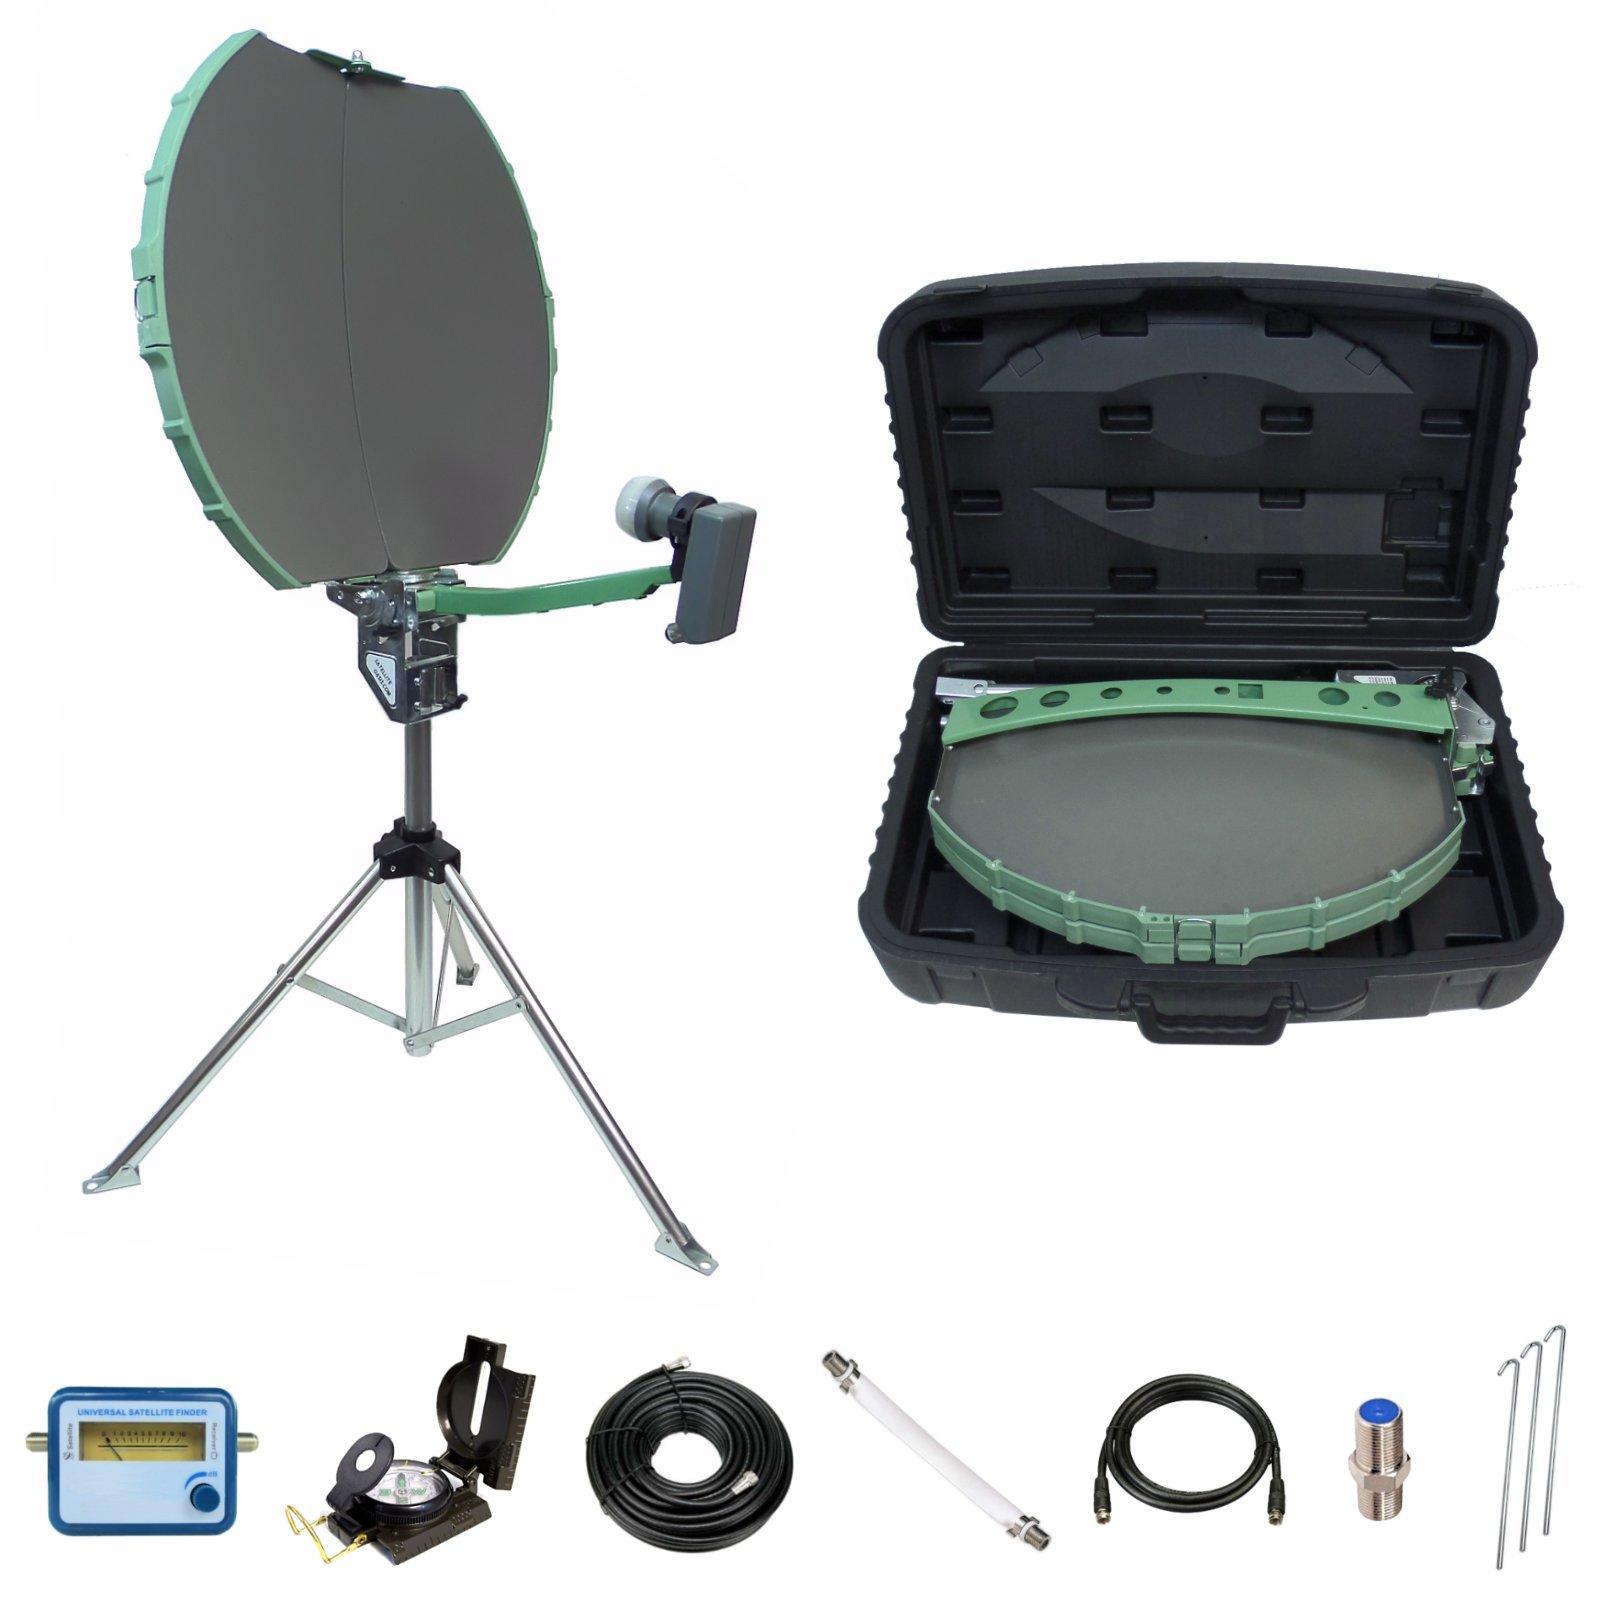 Directv Folding Portable Satellite Dish Rv Tripod Kit - Refurbished